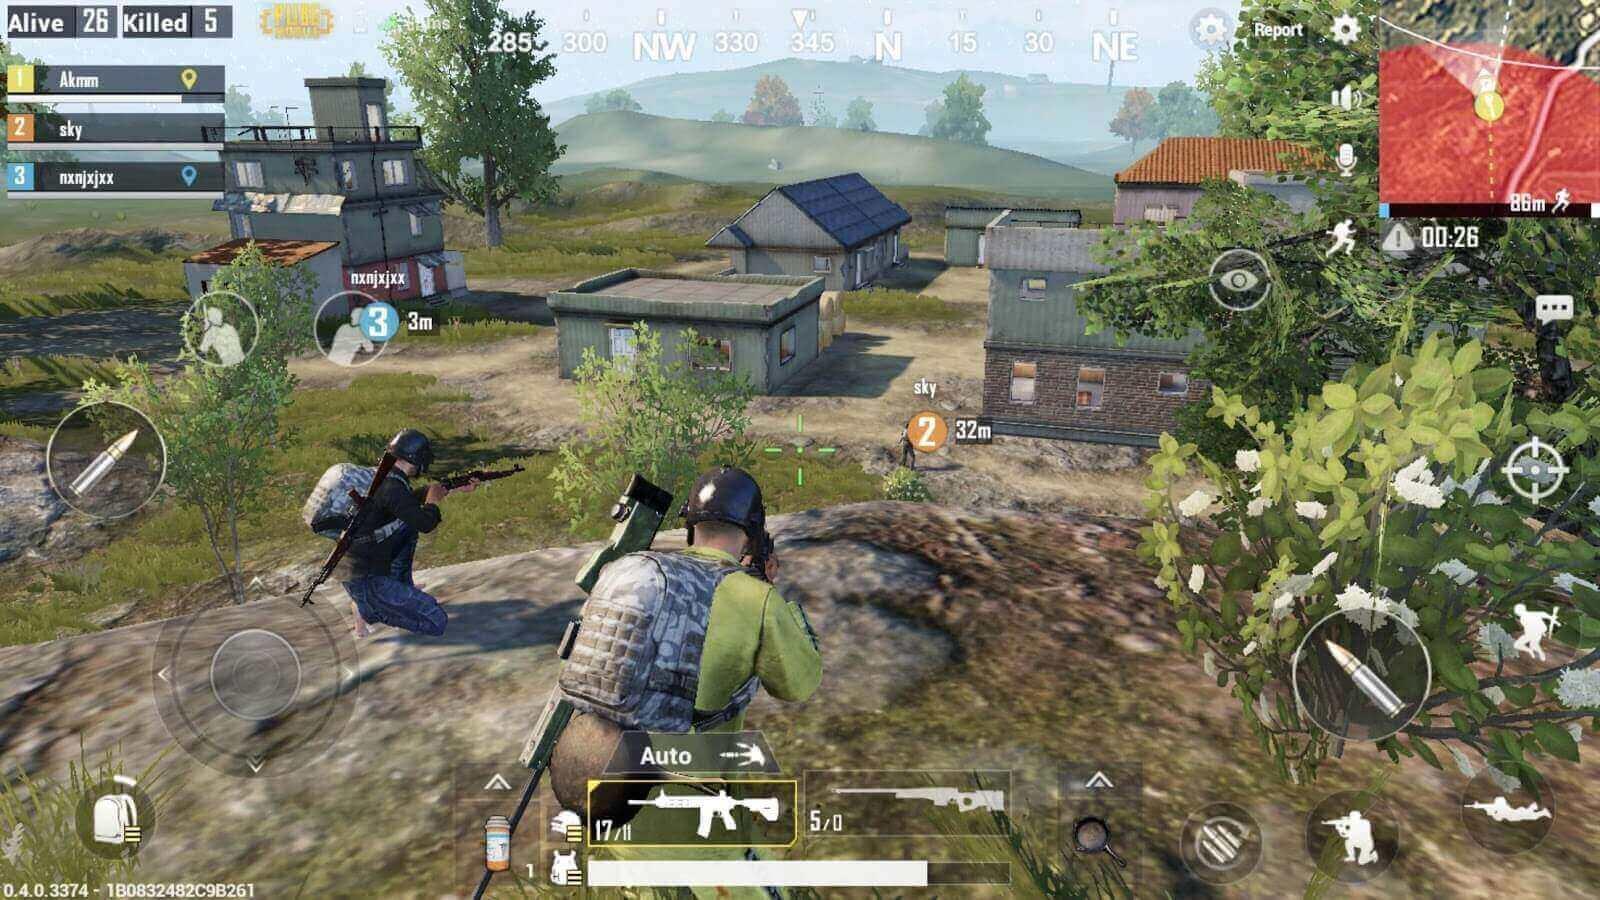 تحميل وتثبيت لعبة ببجي للكمبيوتر Download Pubg Mobile On Pc